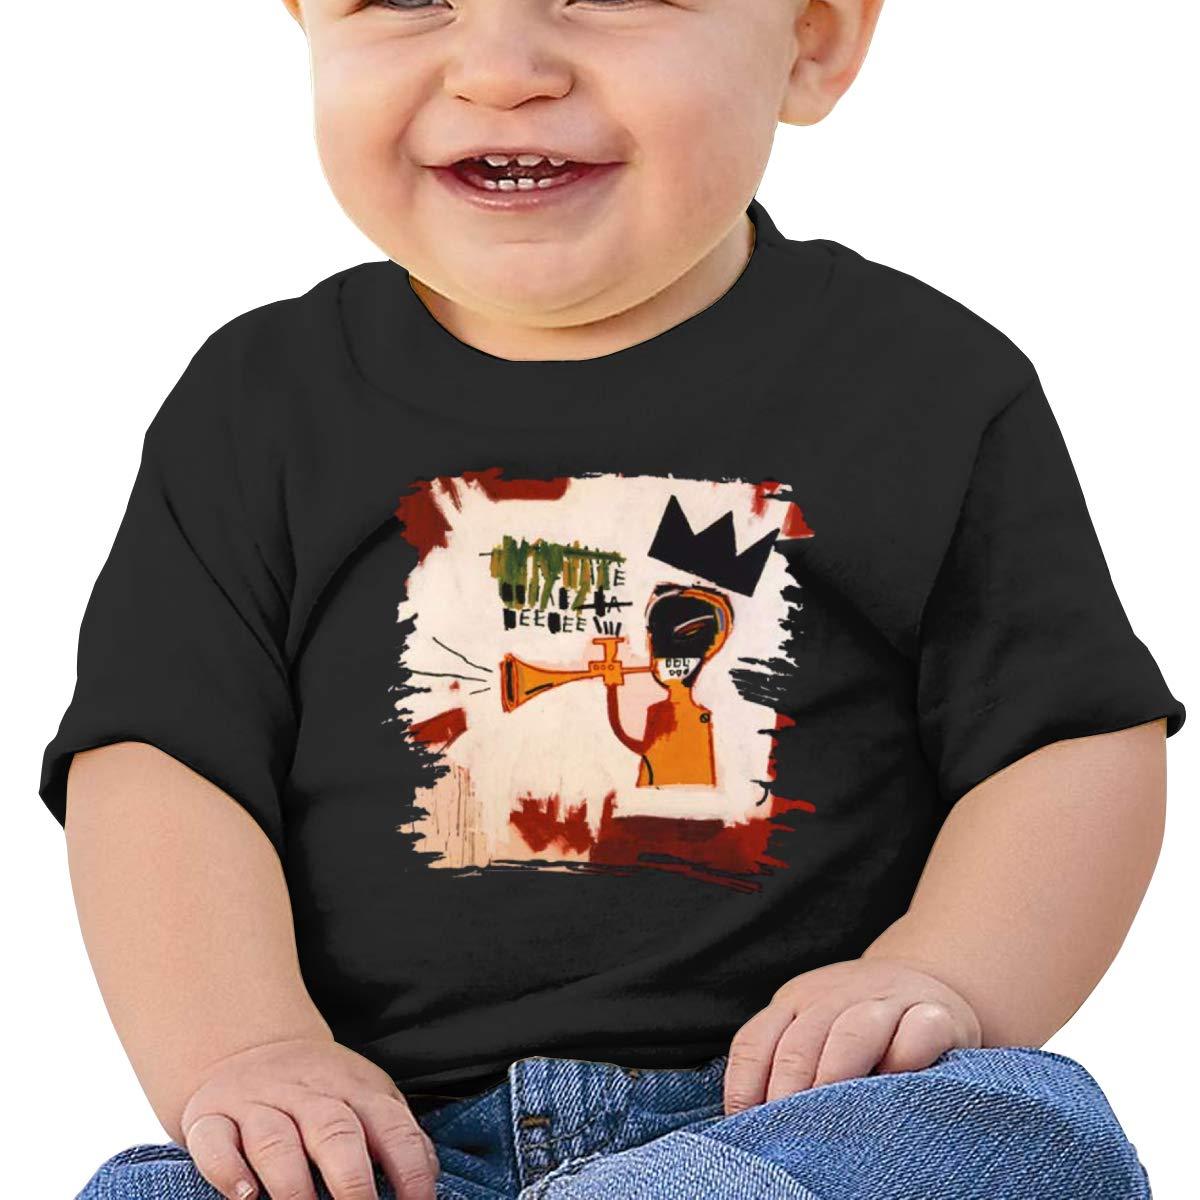 MONIKAL Unisex Infant Short Sleeve T-Shirt Jean-Michel-Basquiat Toddler Kids Organic Cotton Graphic Tee Tops